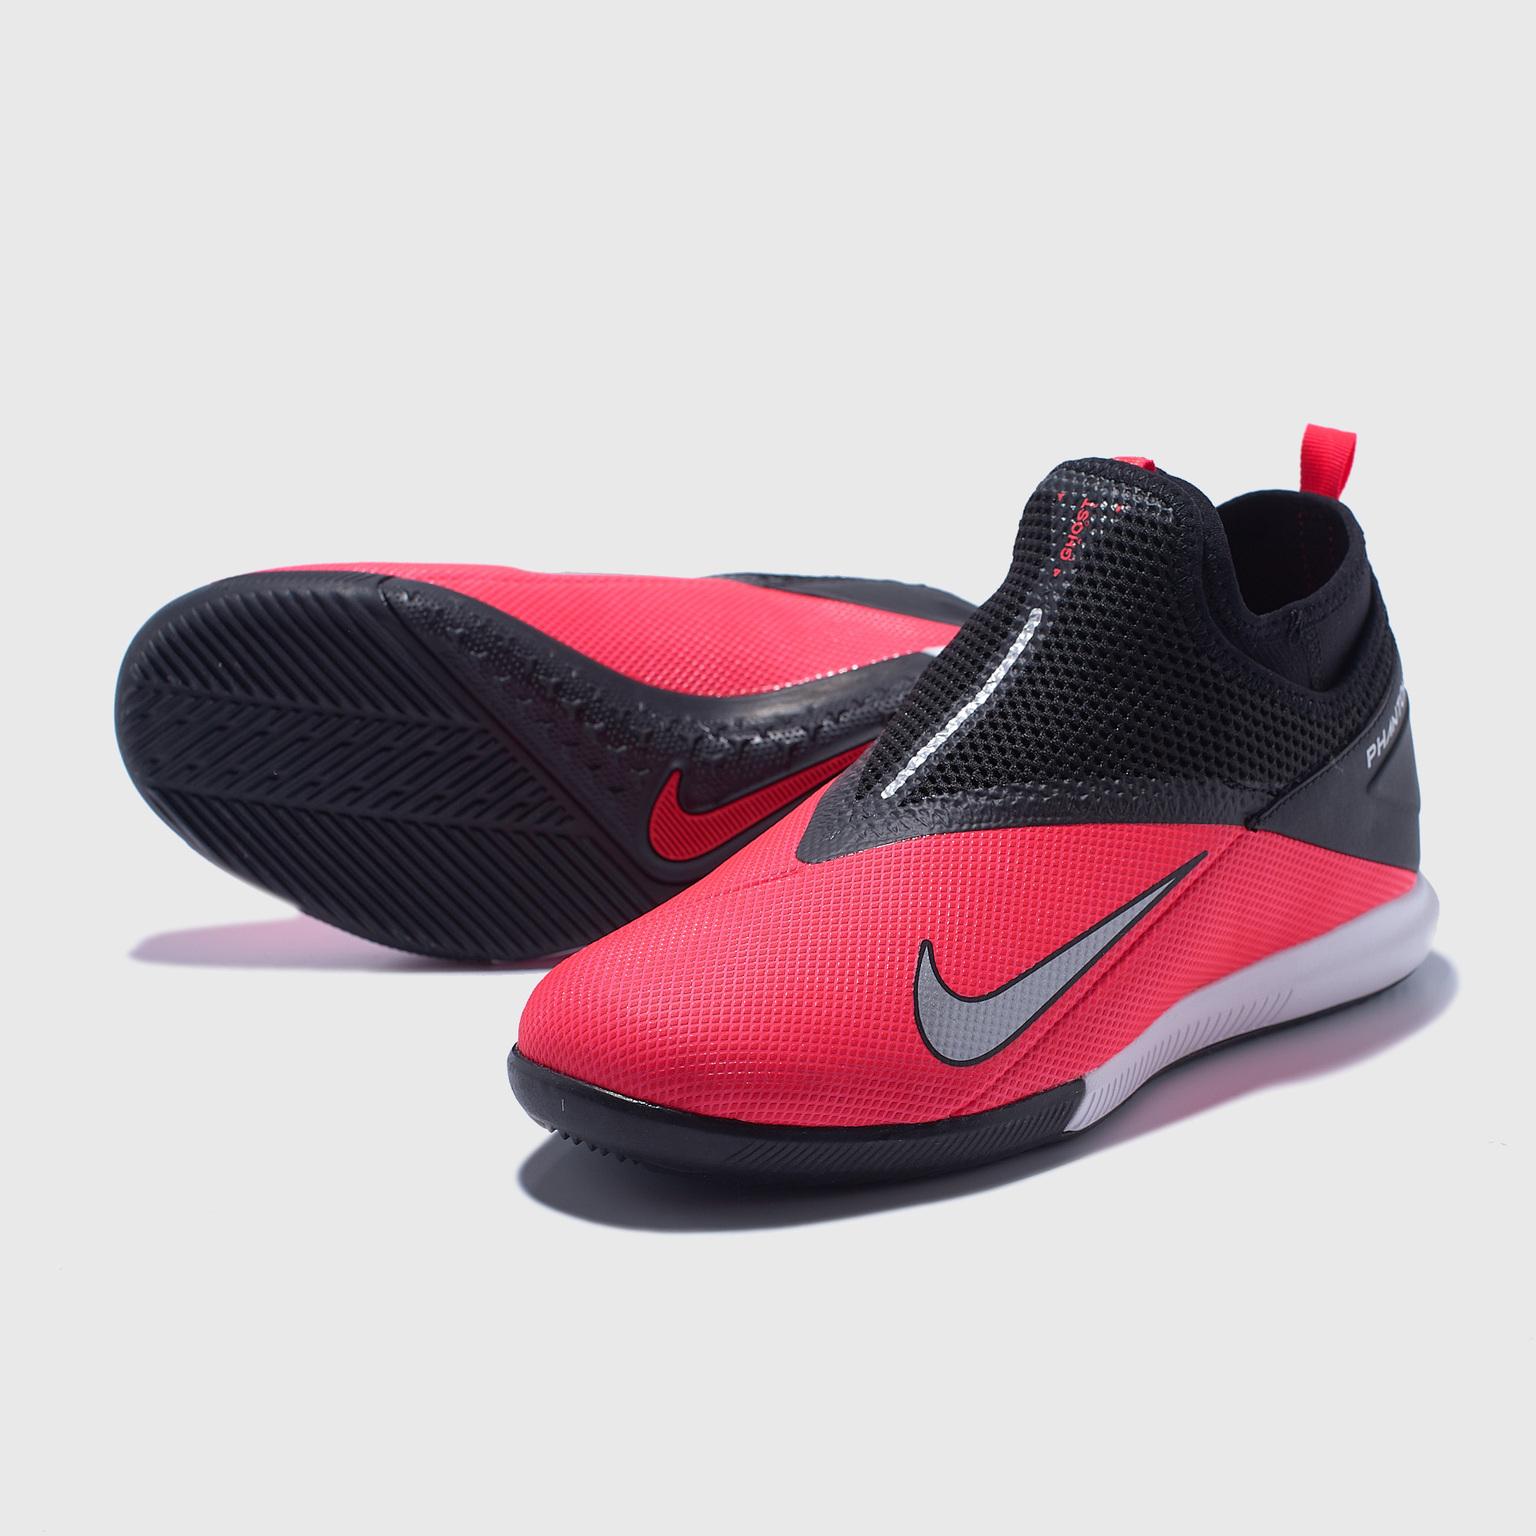 Футзалки детские Nike Phantom Vision 2 Academy DF IC CD4071-606 шиповки детские nike phantom vision 2 academy df tf cd4078 606